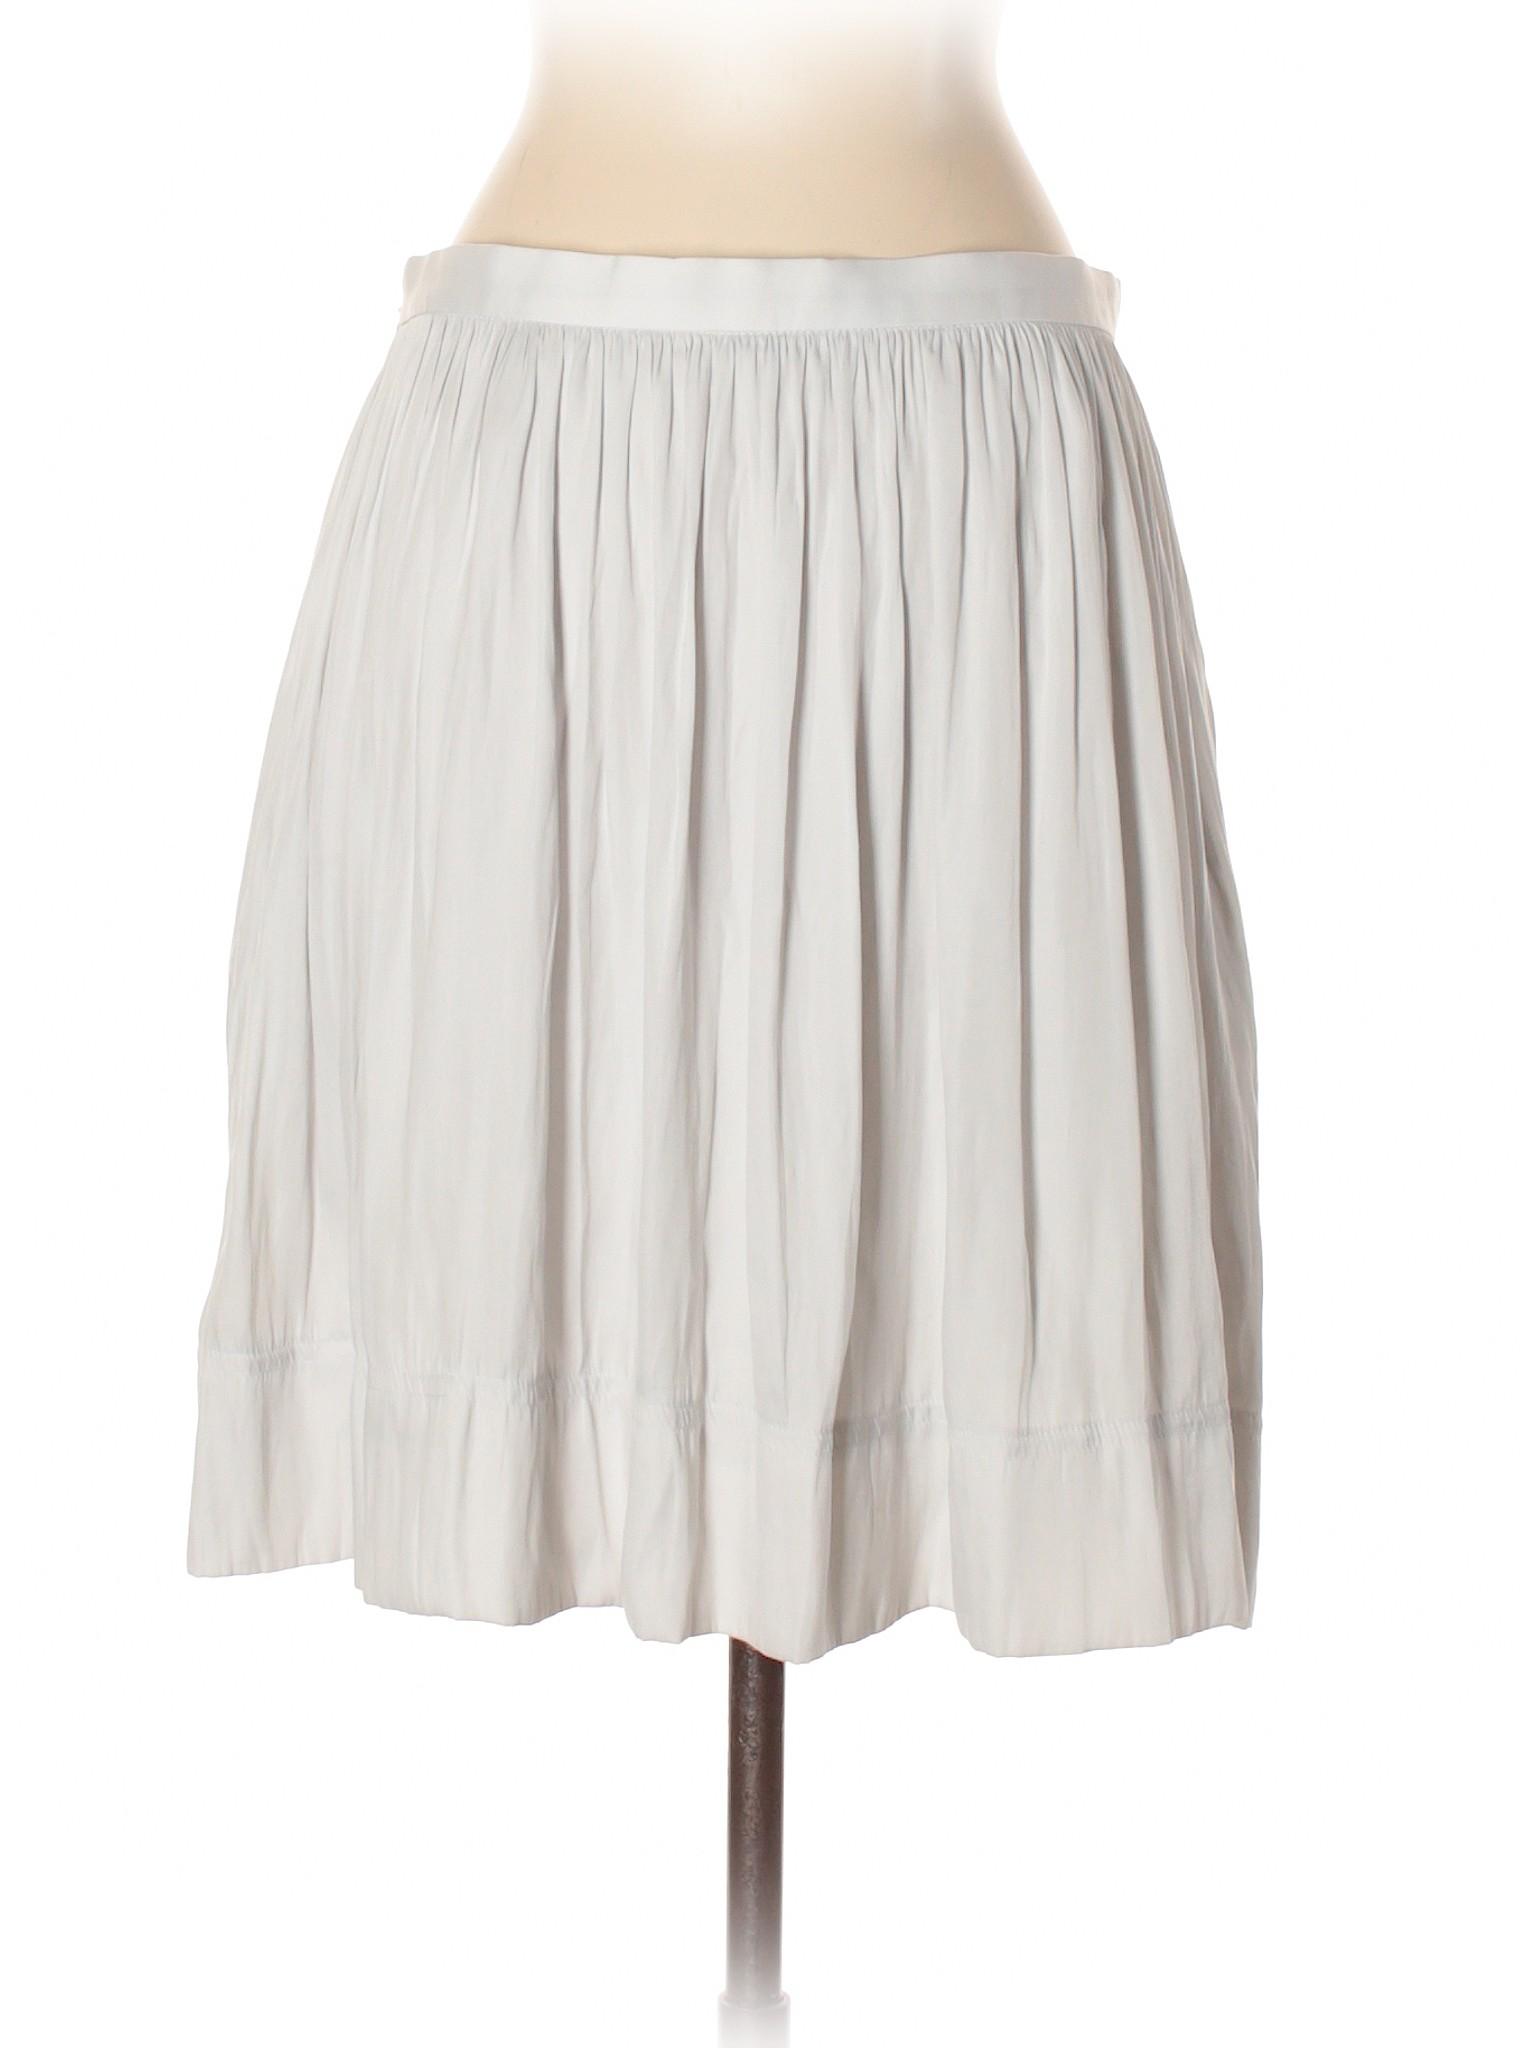 Casual Skirt Casual Boutique Boutique Casual Boutique Casual Skirt Boutique Casual Boutique Skirt Skirt nxaOzXX